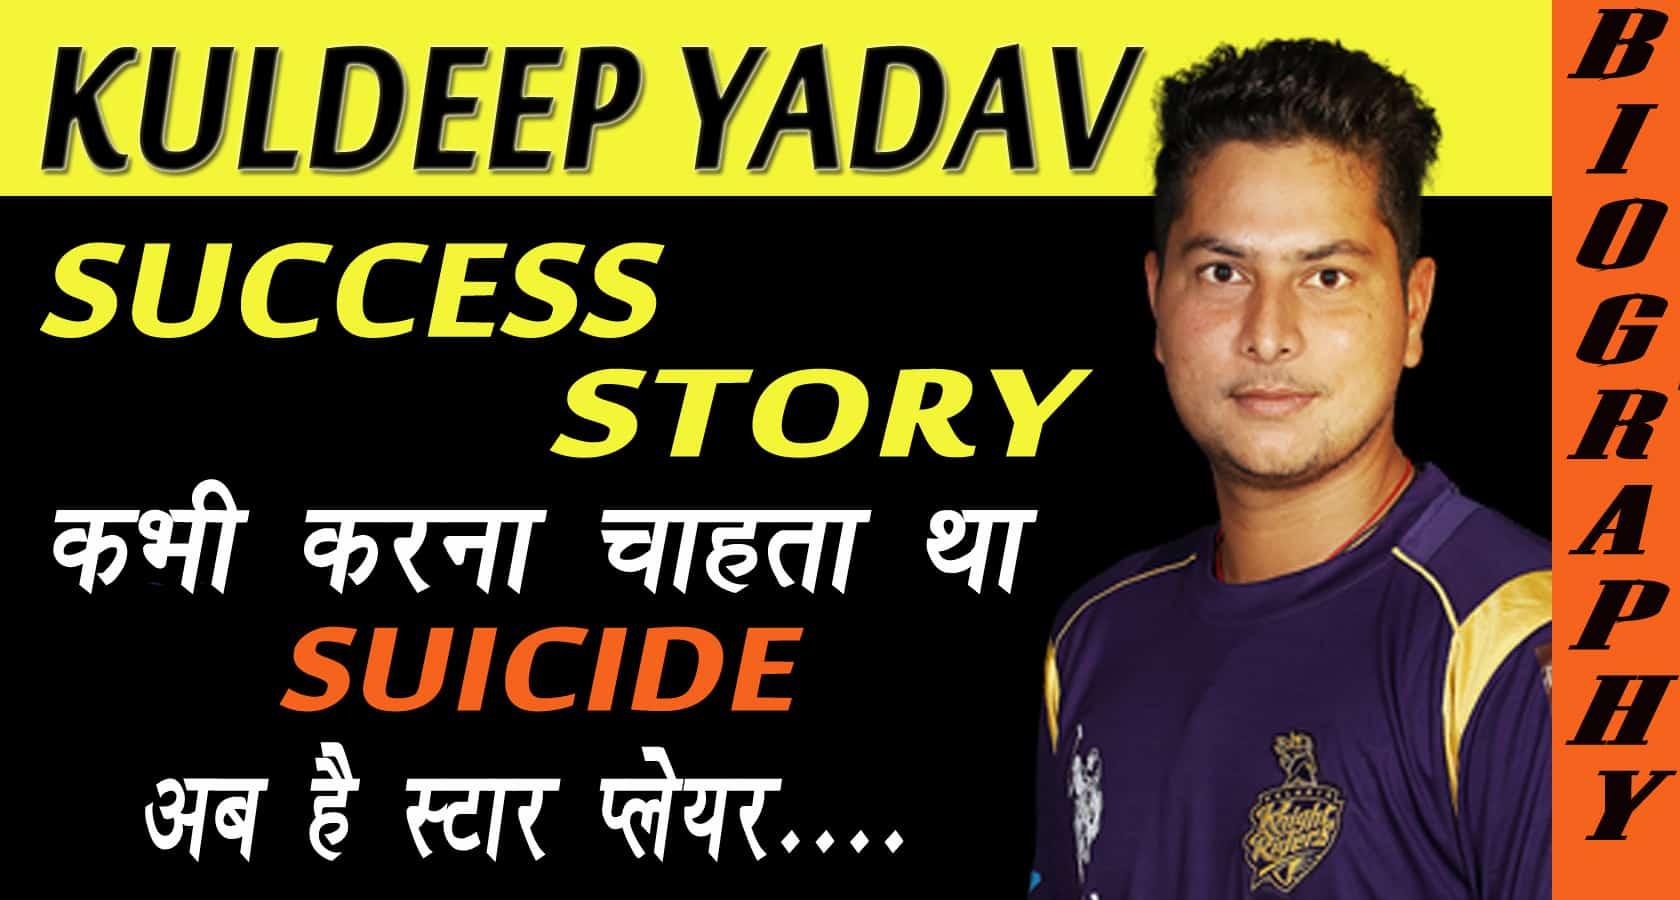 Kuldeep Yadav Lifestyle